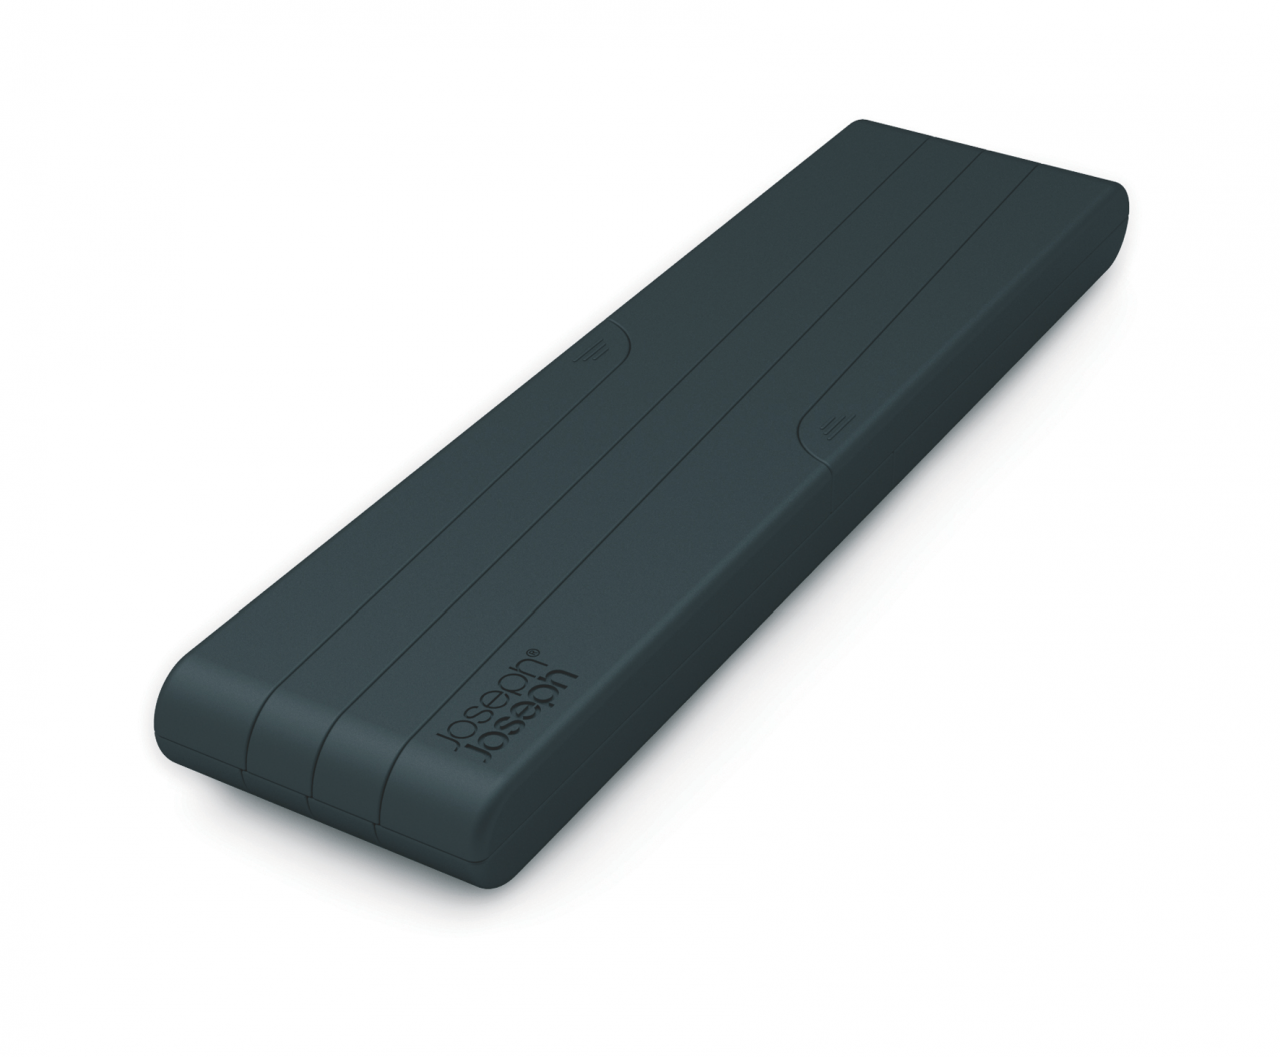 Stretch Topfuntersetzer schwarz 19.5x5cm